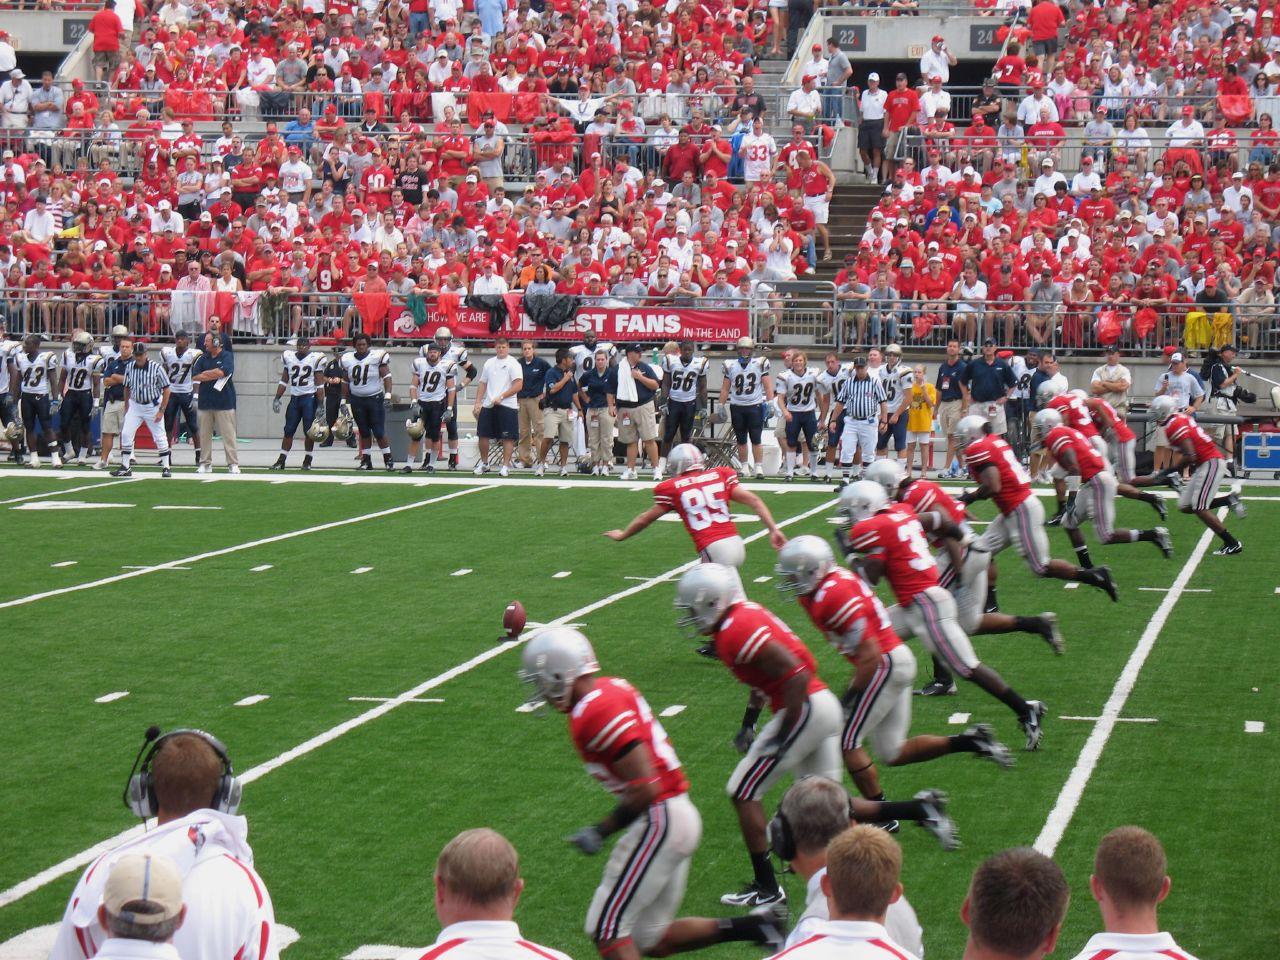 Ohio_State_Buckeyes_kickoff_2007.jpg